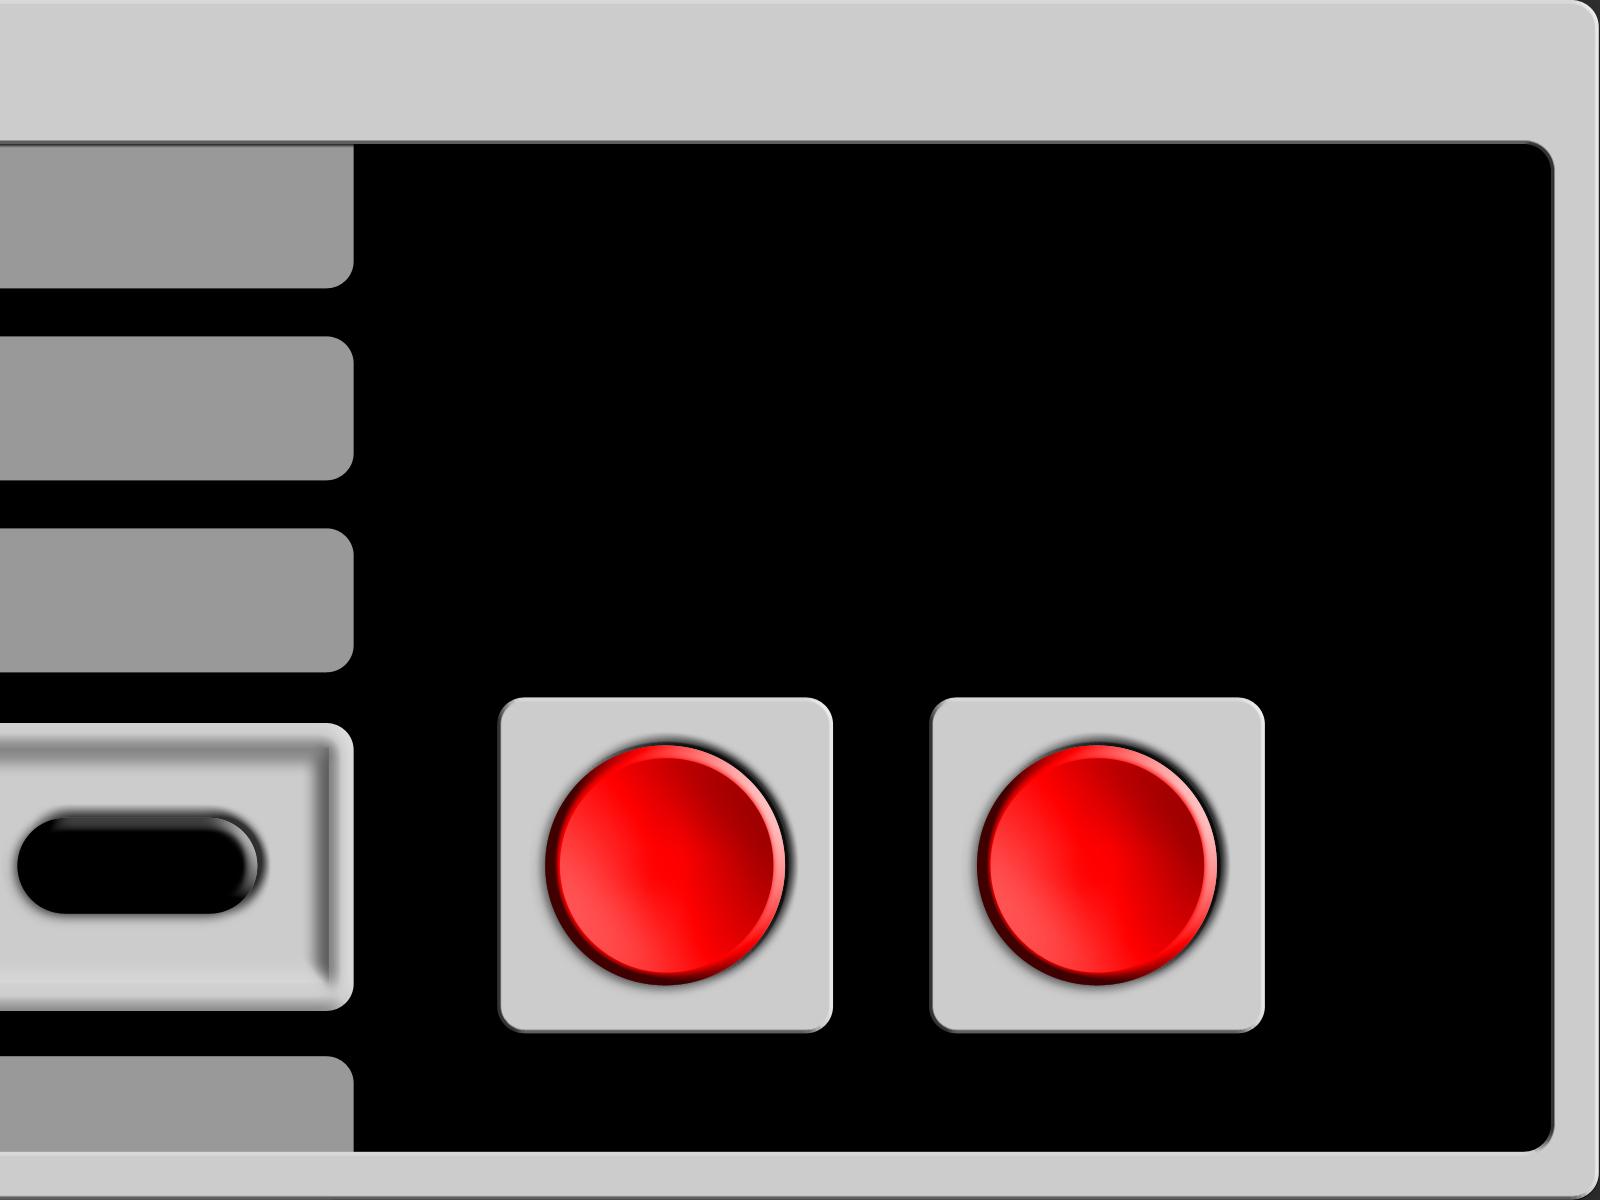 De 20 bästa NES-spelen: Plats 5